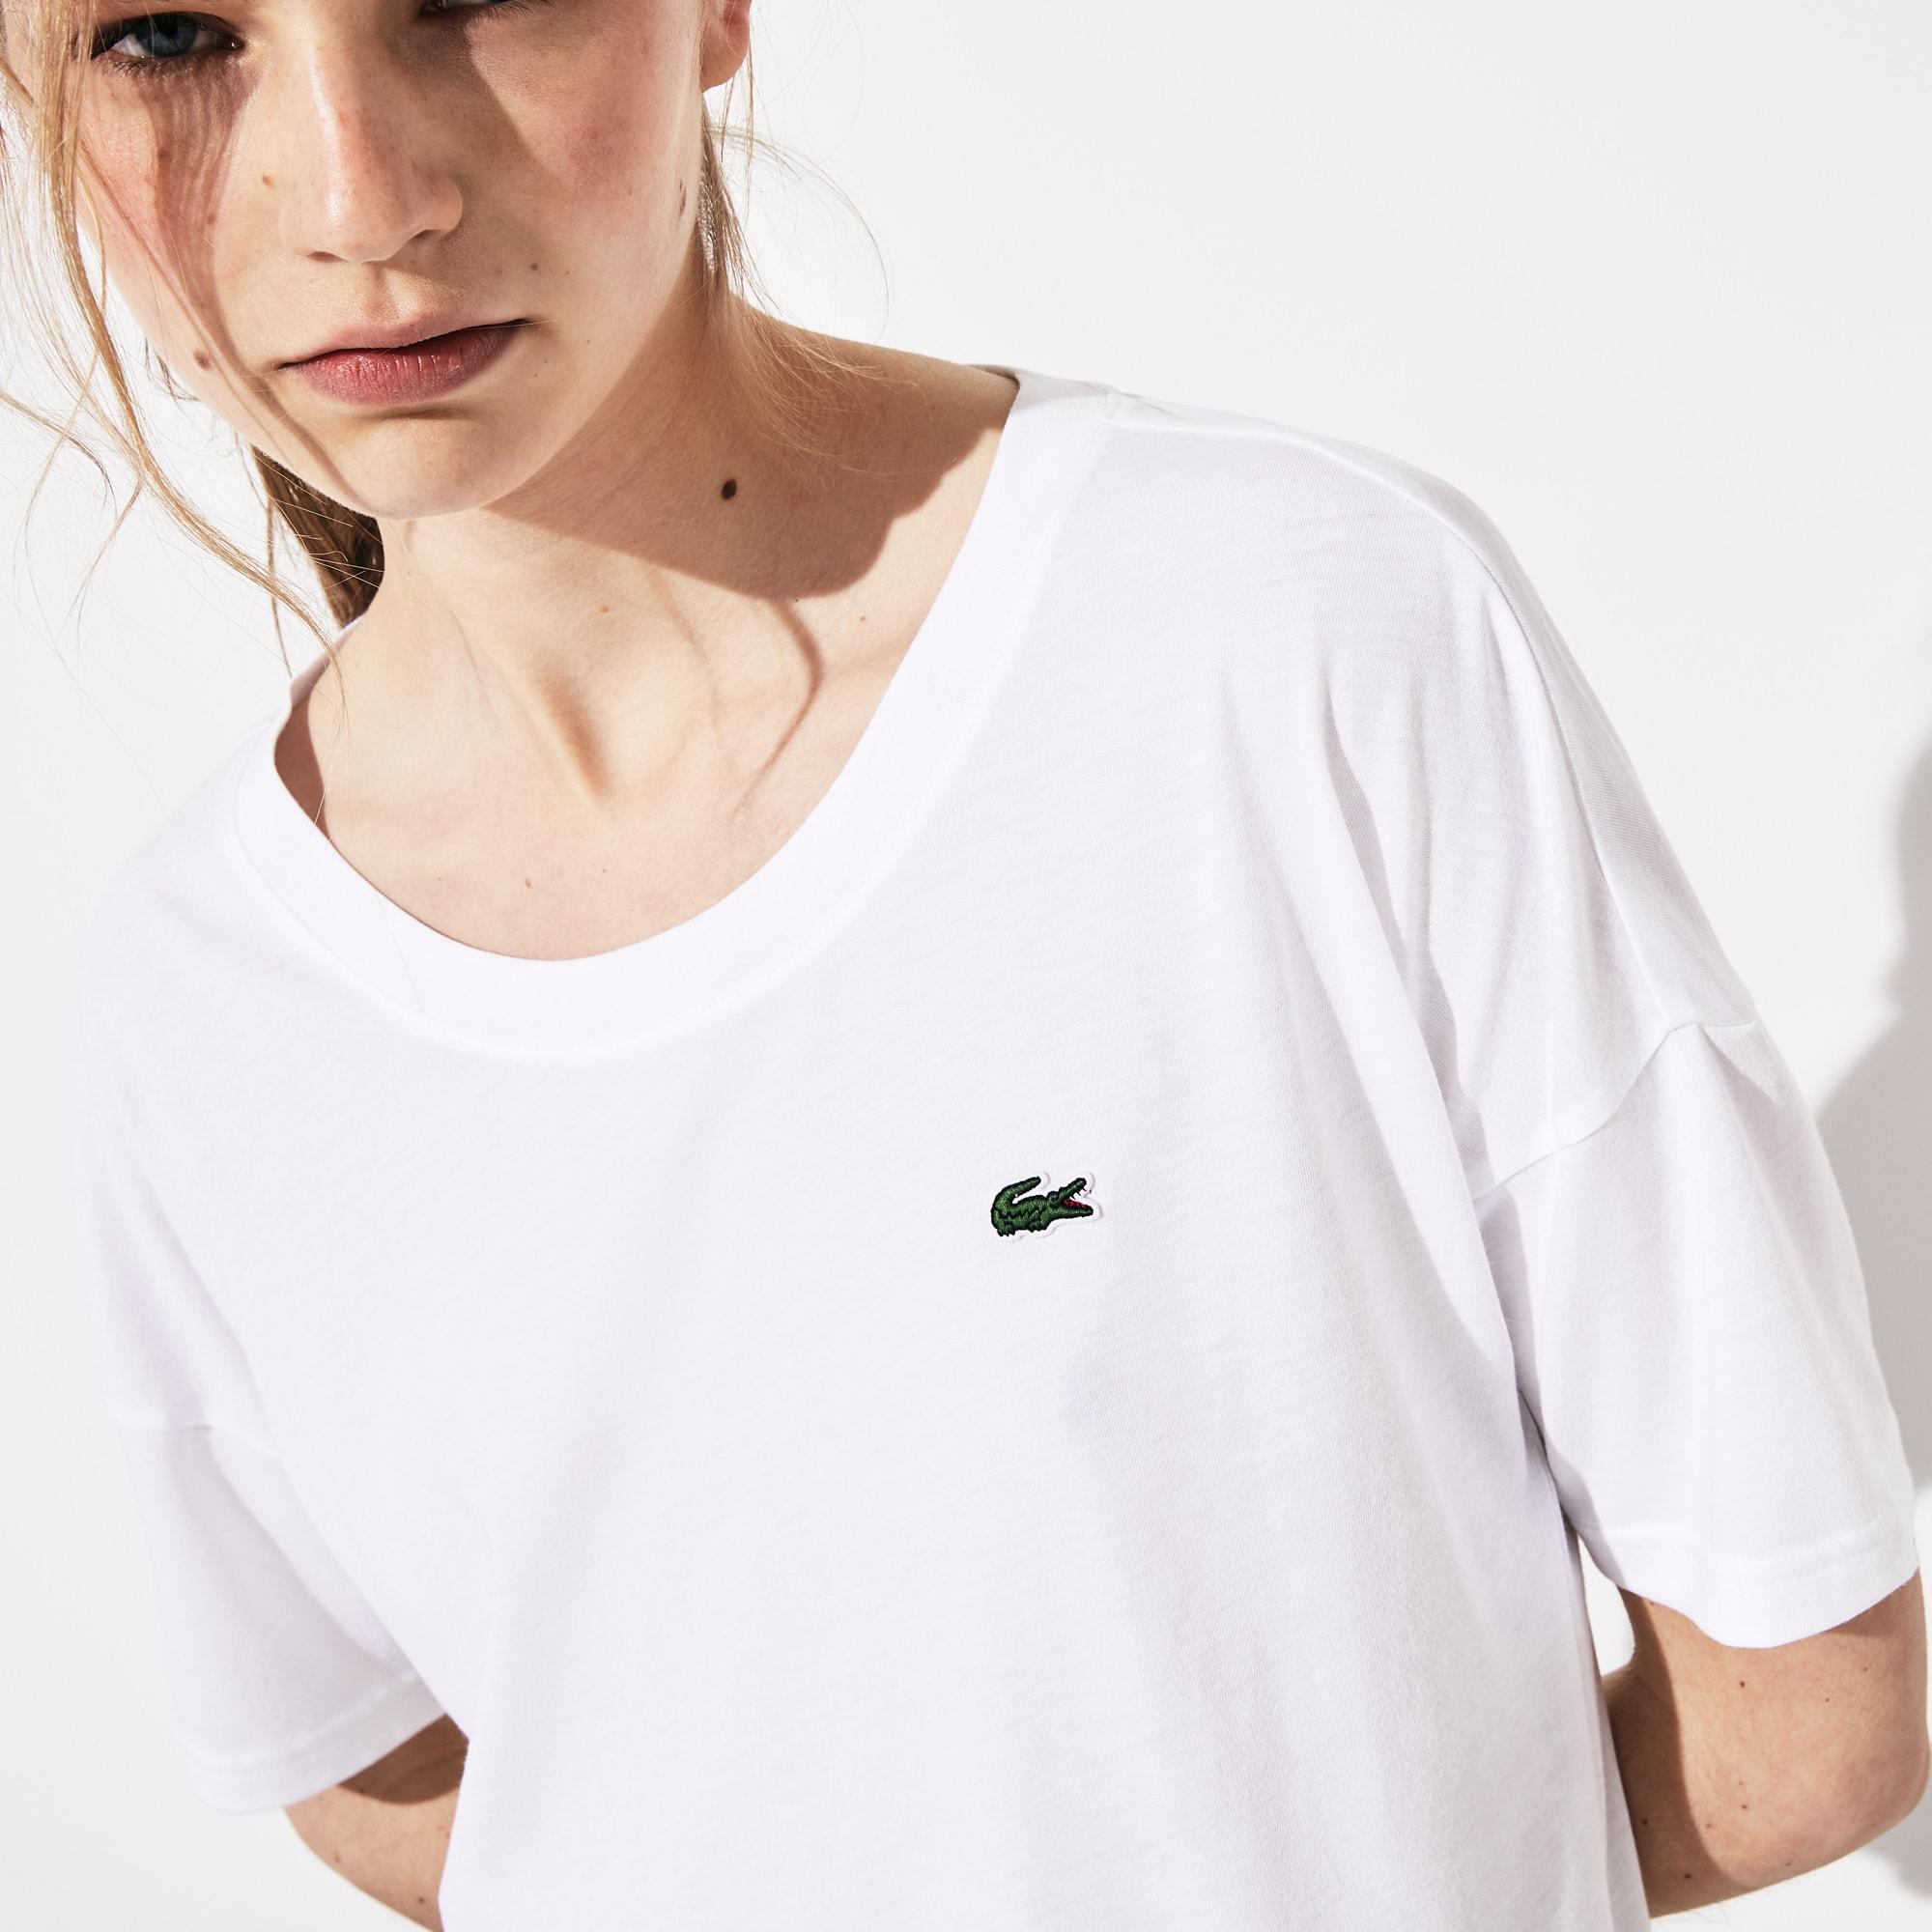 1368992d Women's Lacoste SPORT Signature Band Loose Flowing Tennis T-shirt